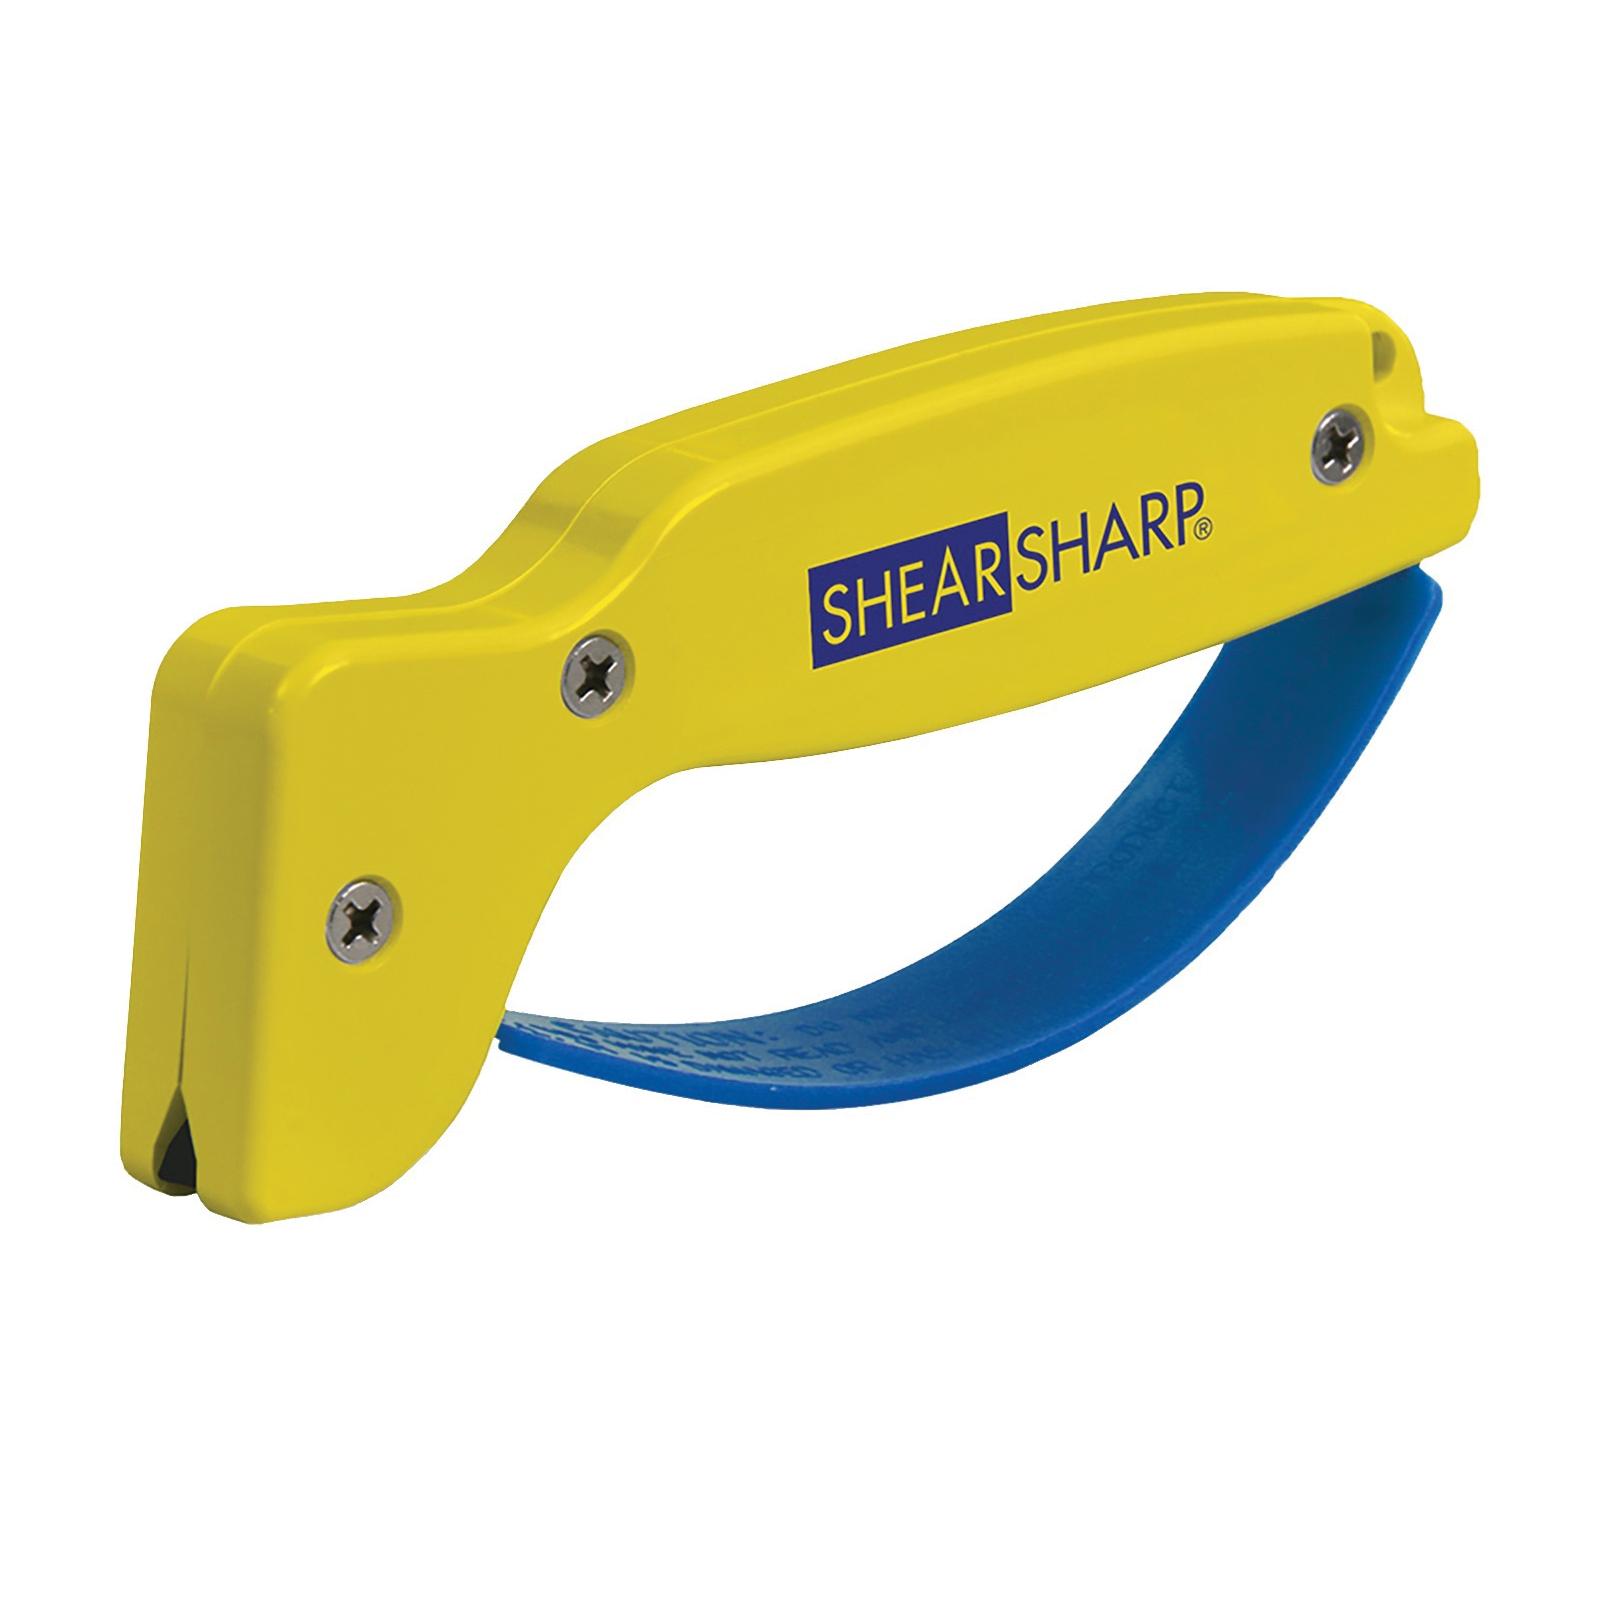 Picture of ACCUSHARP 002 Scissors Sharpener, Tungsten Carbide Abrasive